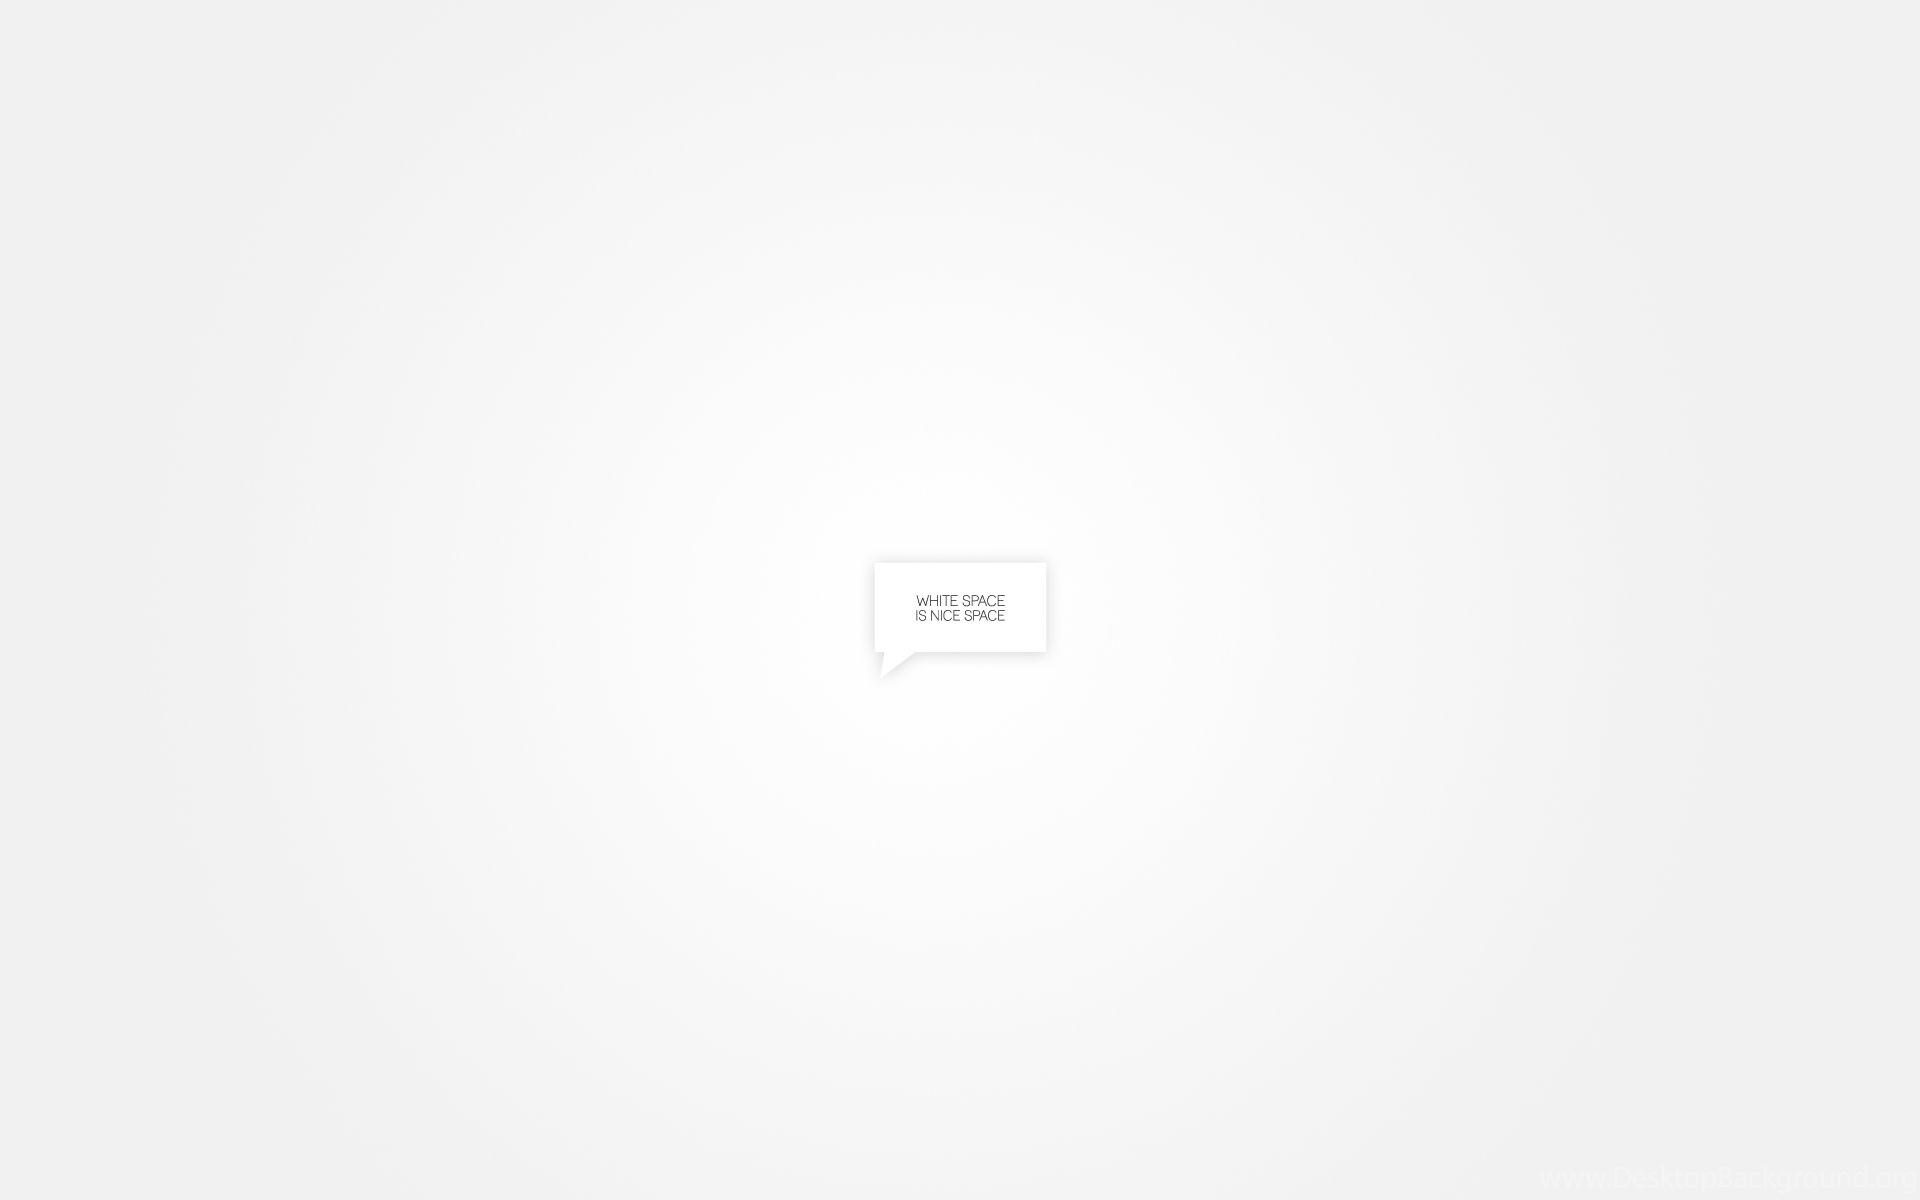 White Minimalist Wallpapers   Top White Minimalist 1920x1200